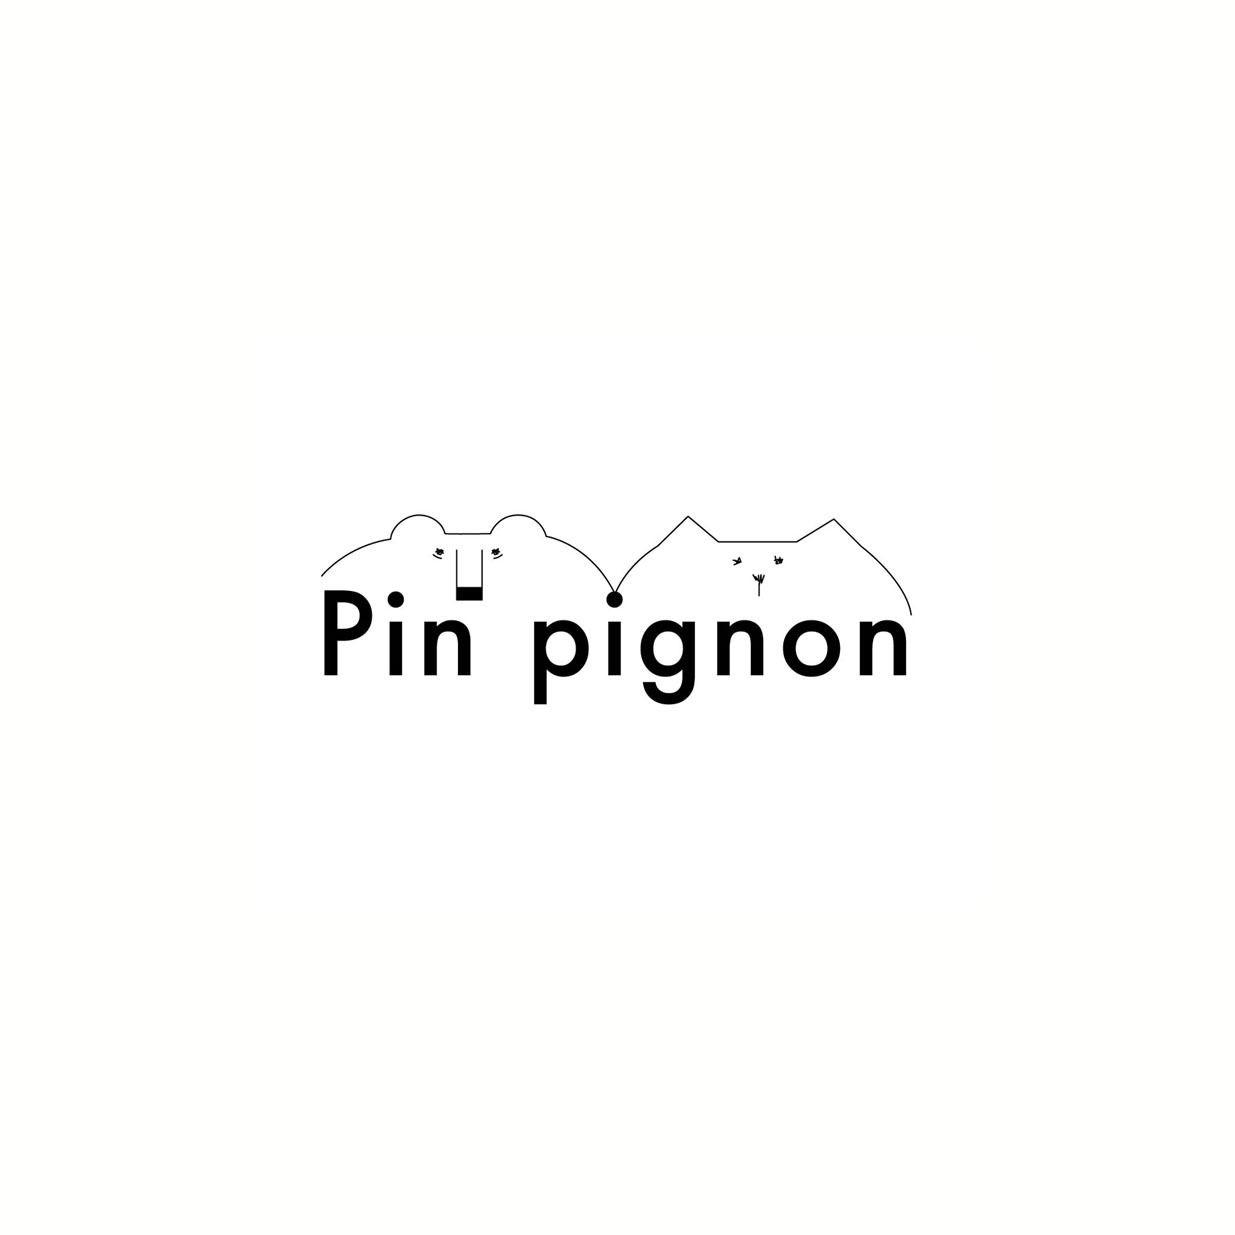 Pinpignon